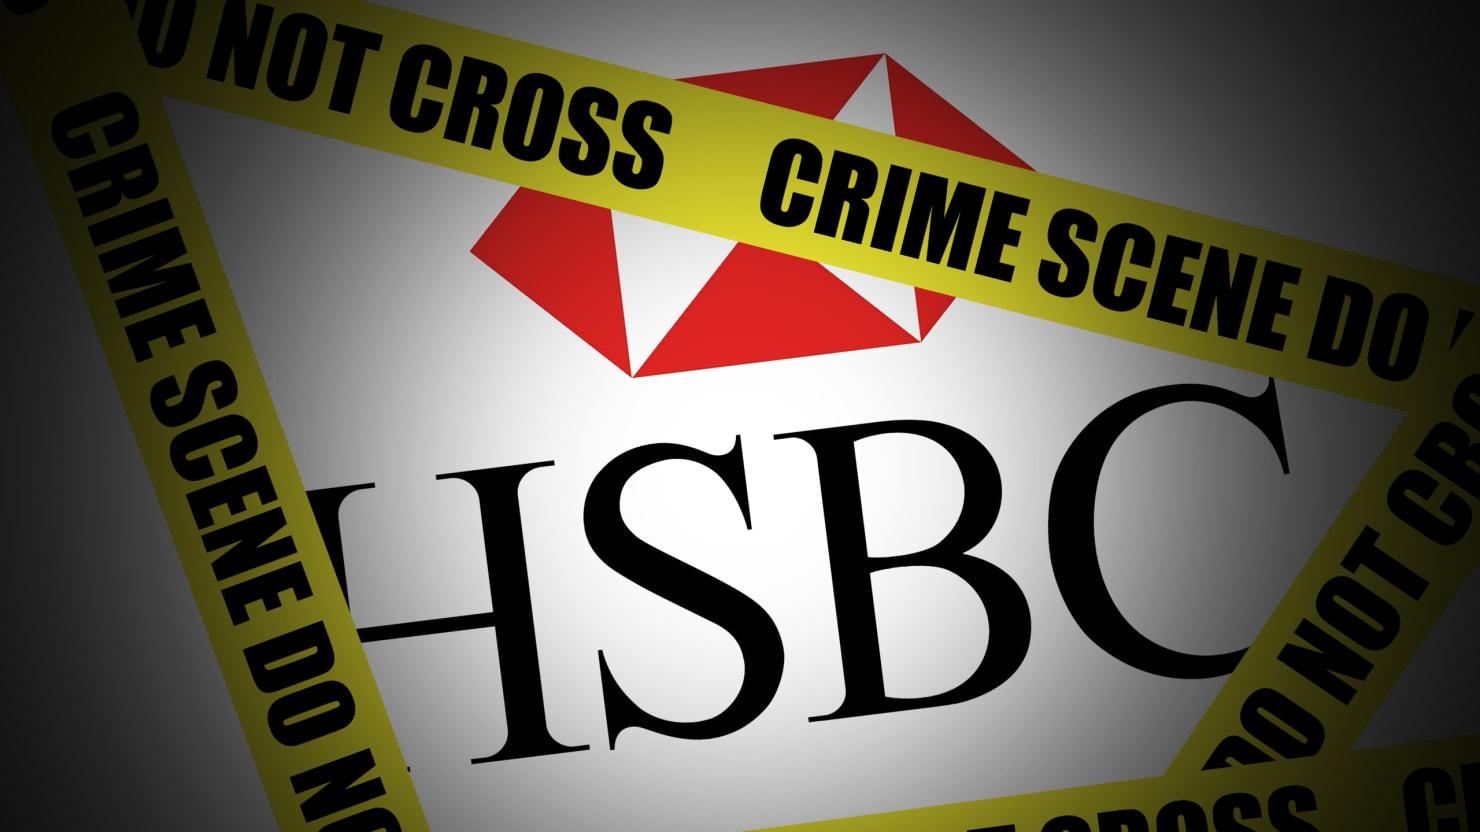 HSBC Got Away With Buying Cocaine Plane